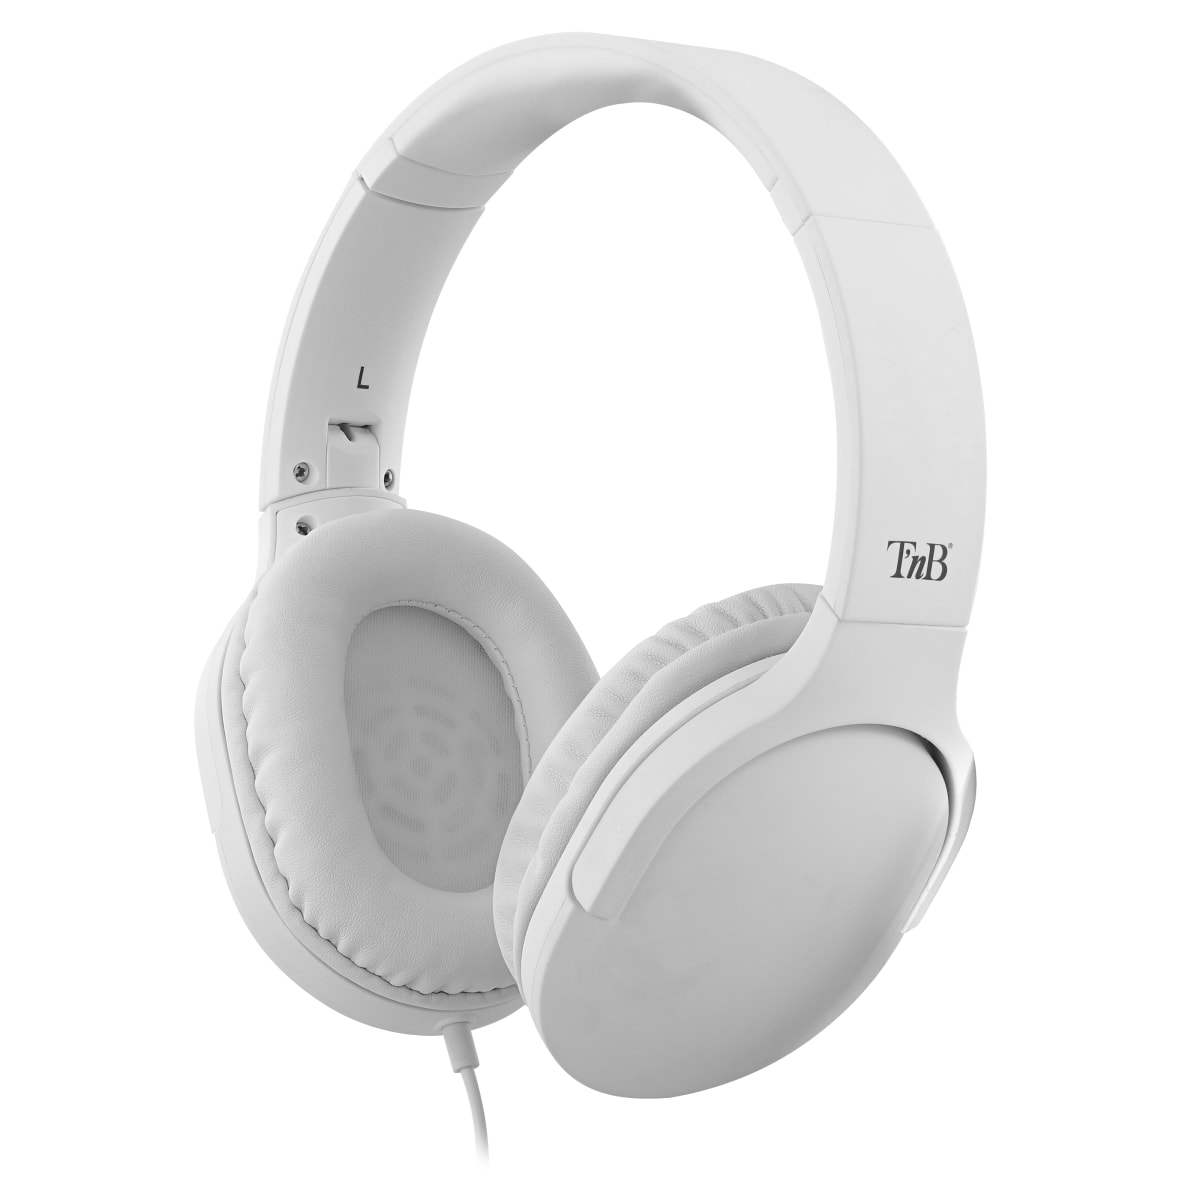 Casque filaire C SOUND jack 3,5mm / USB Type-C blanc